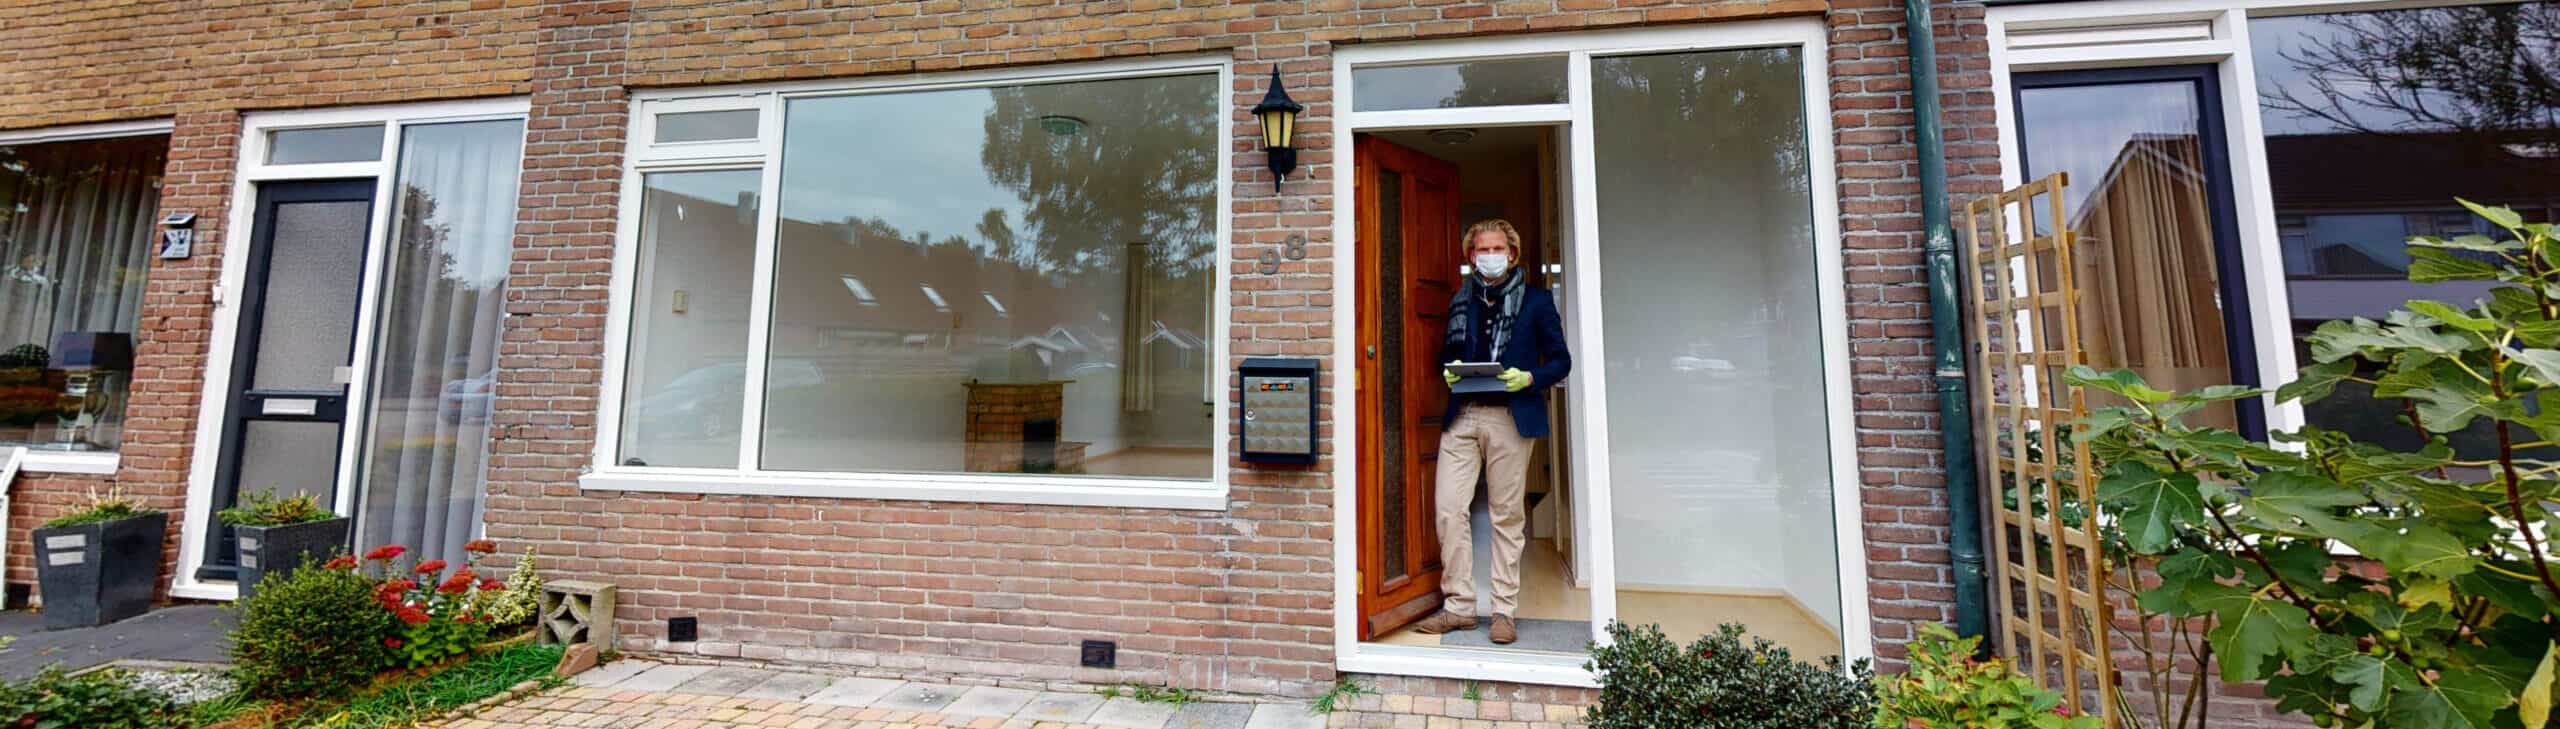 90-m2-woonruimte-te-huur-te-Veendam-10152020_201539